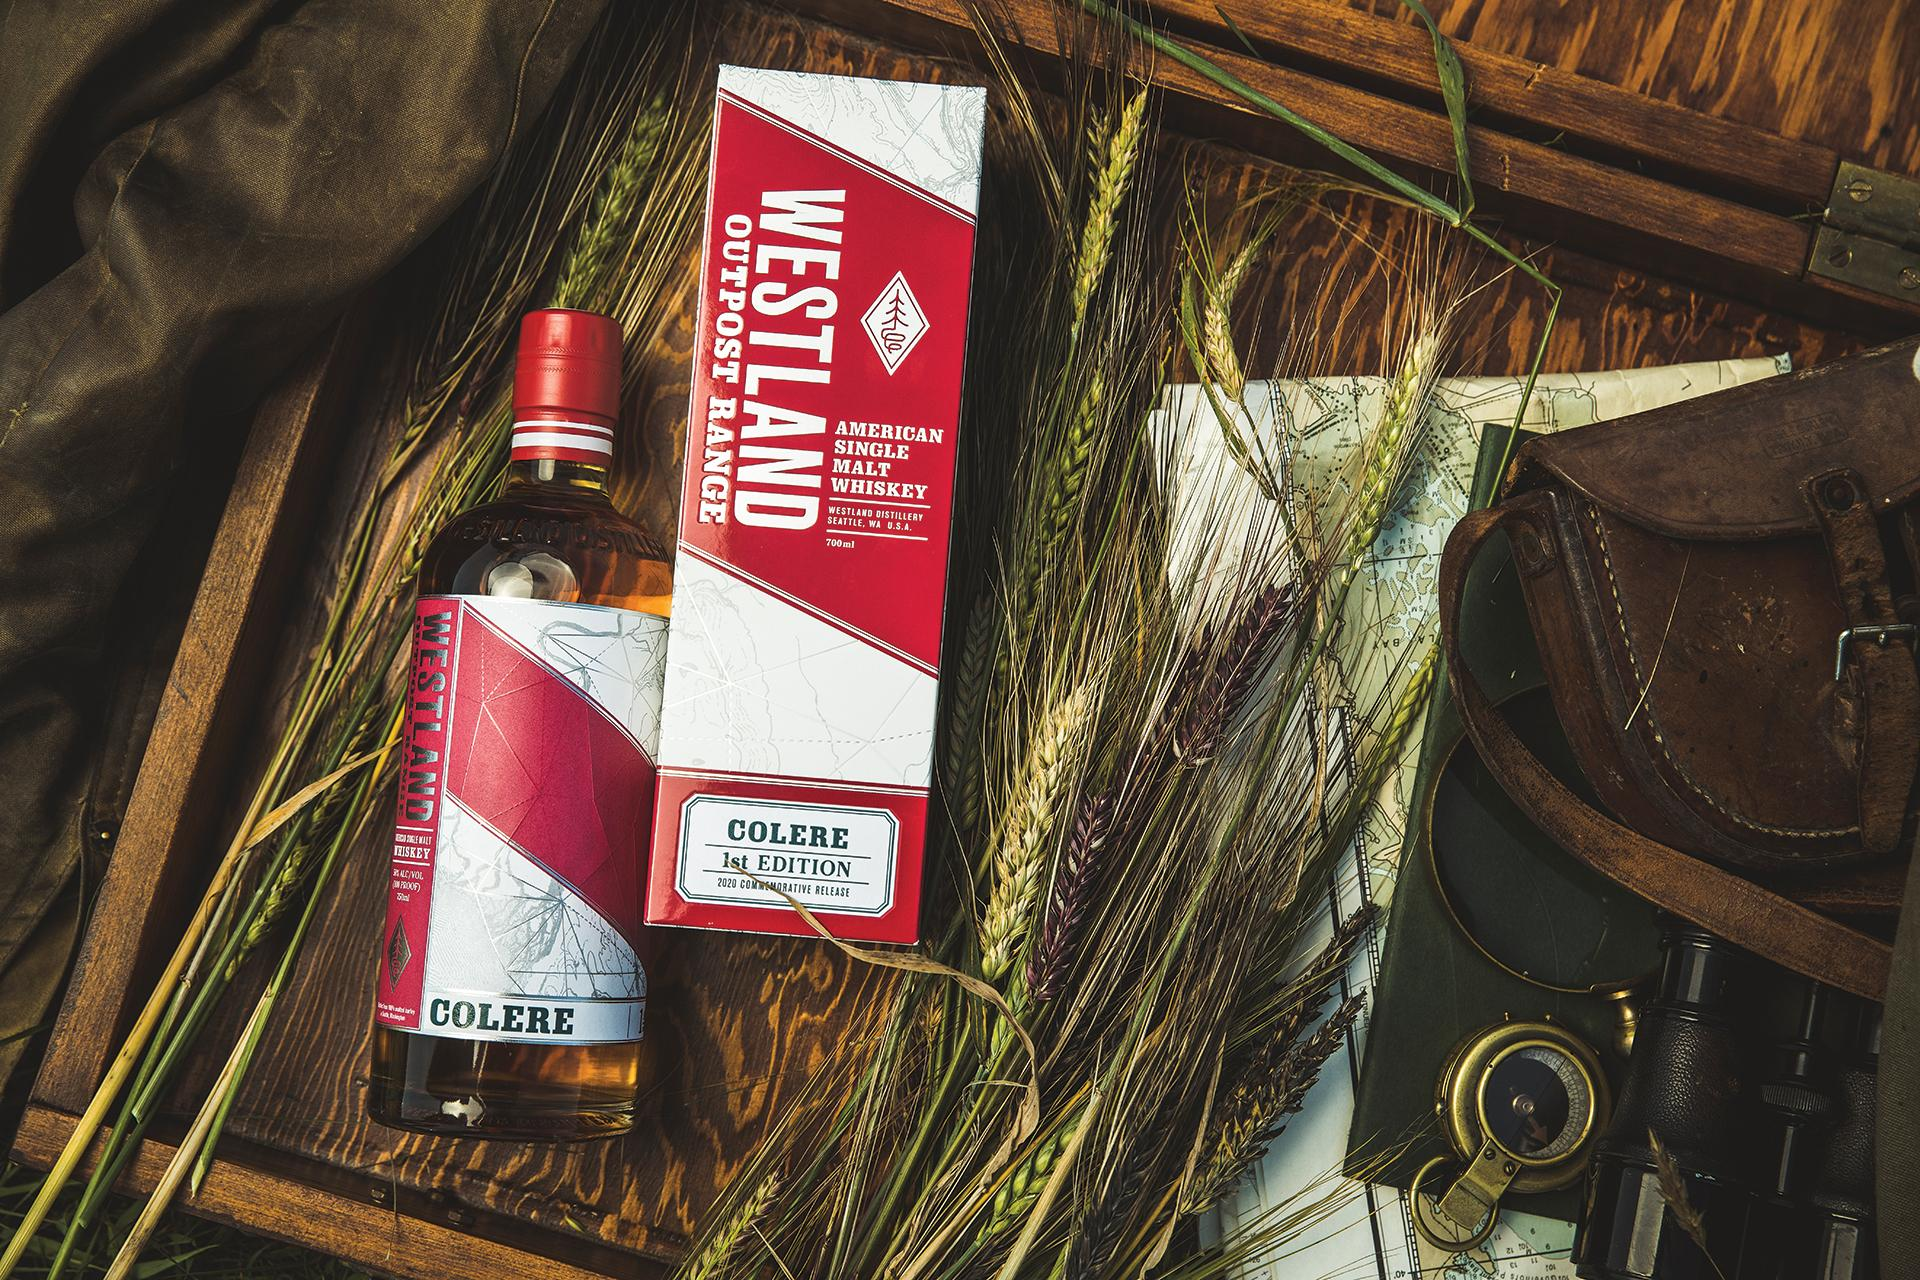 World Whisky Day: WESTLAND COLERE EDITION 1